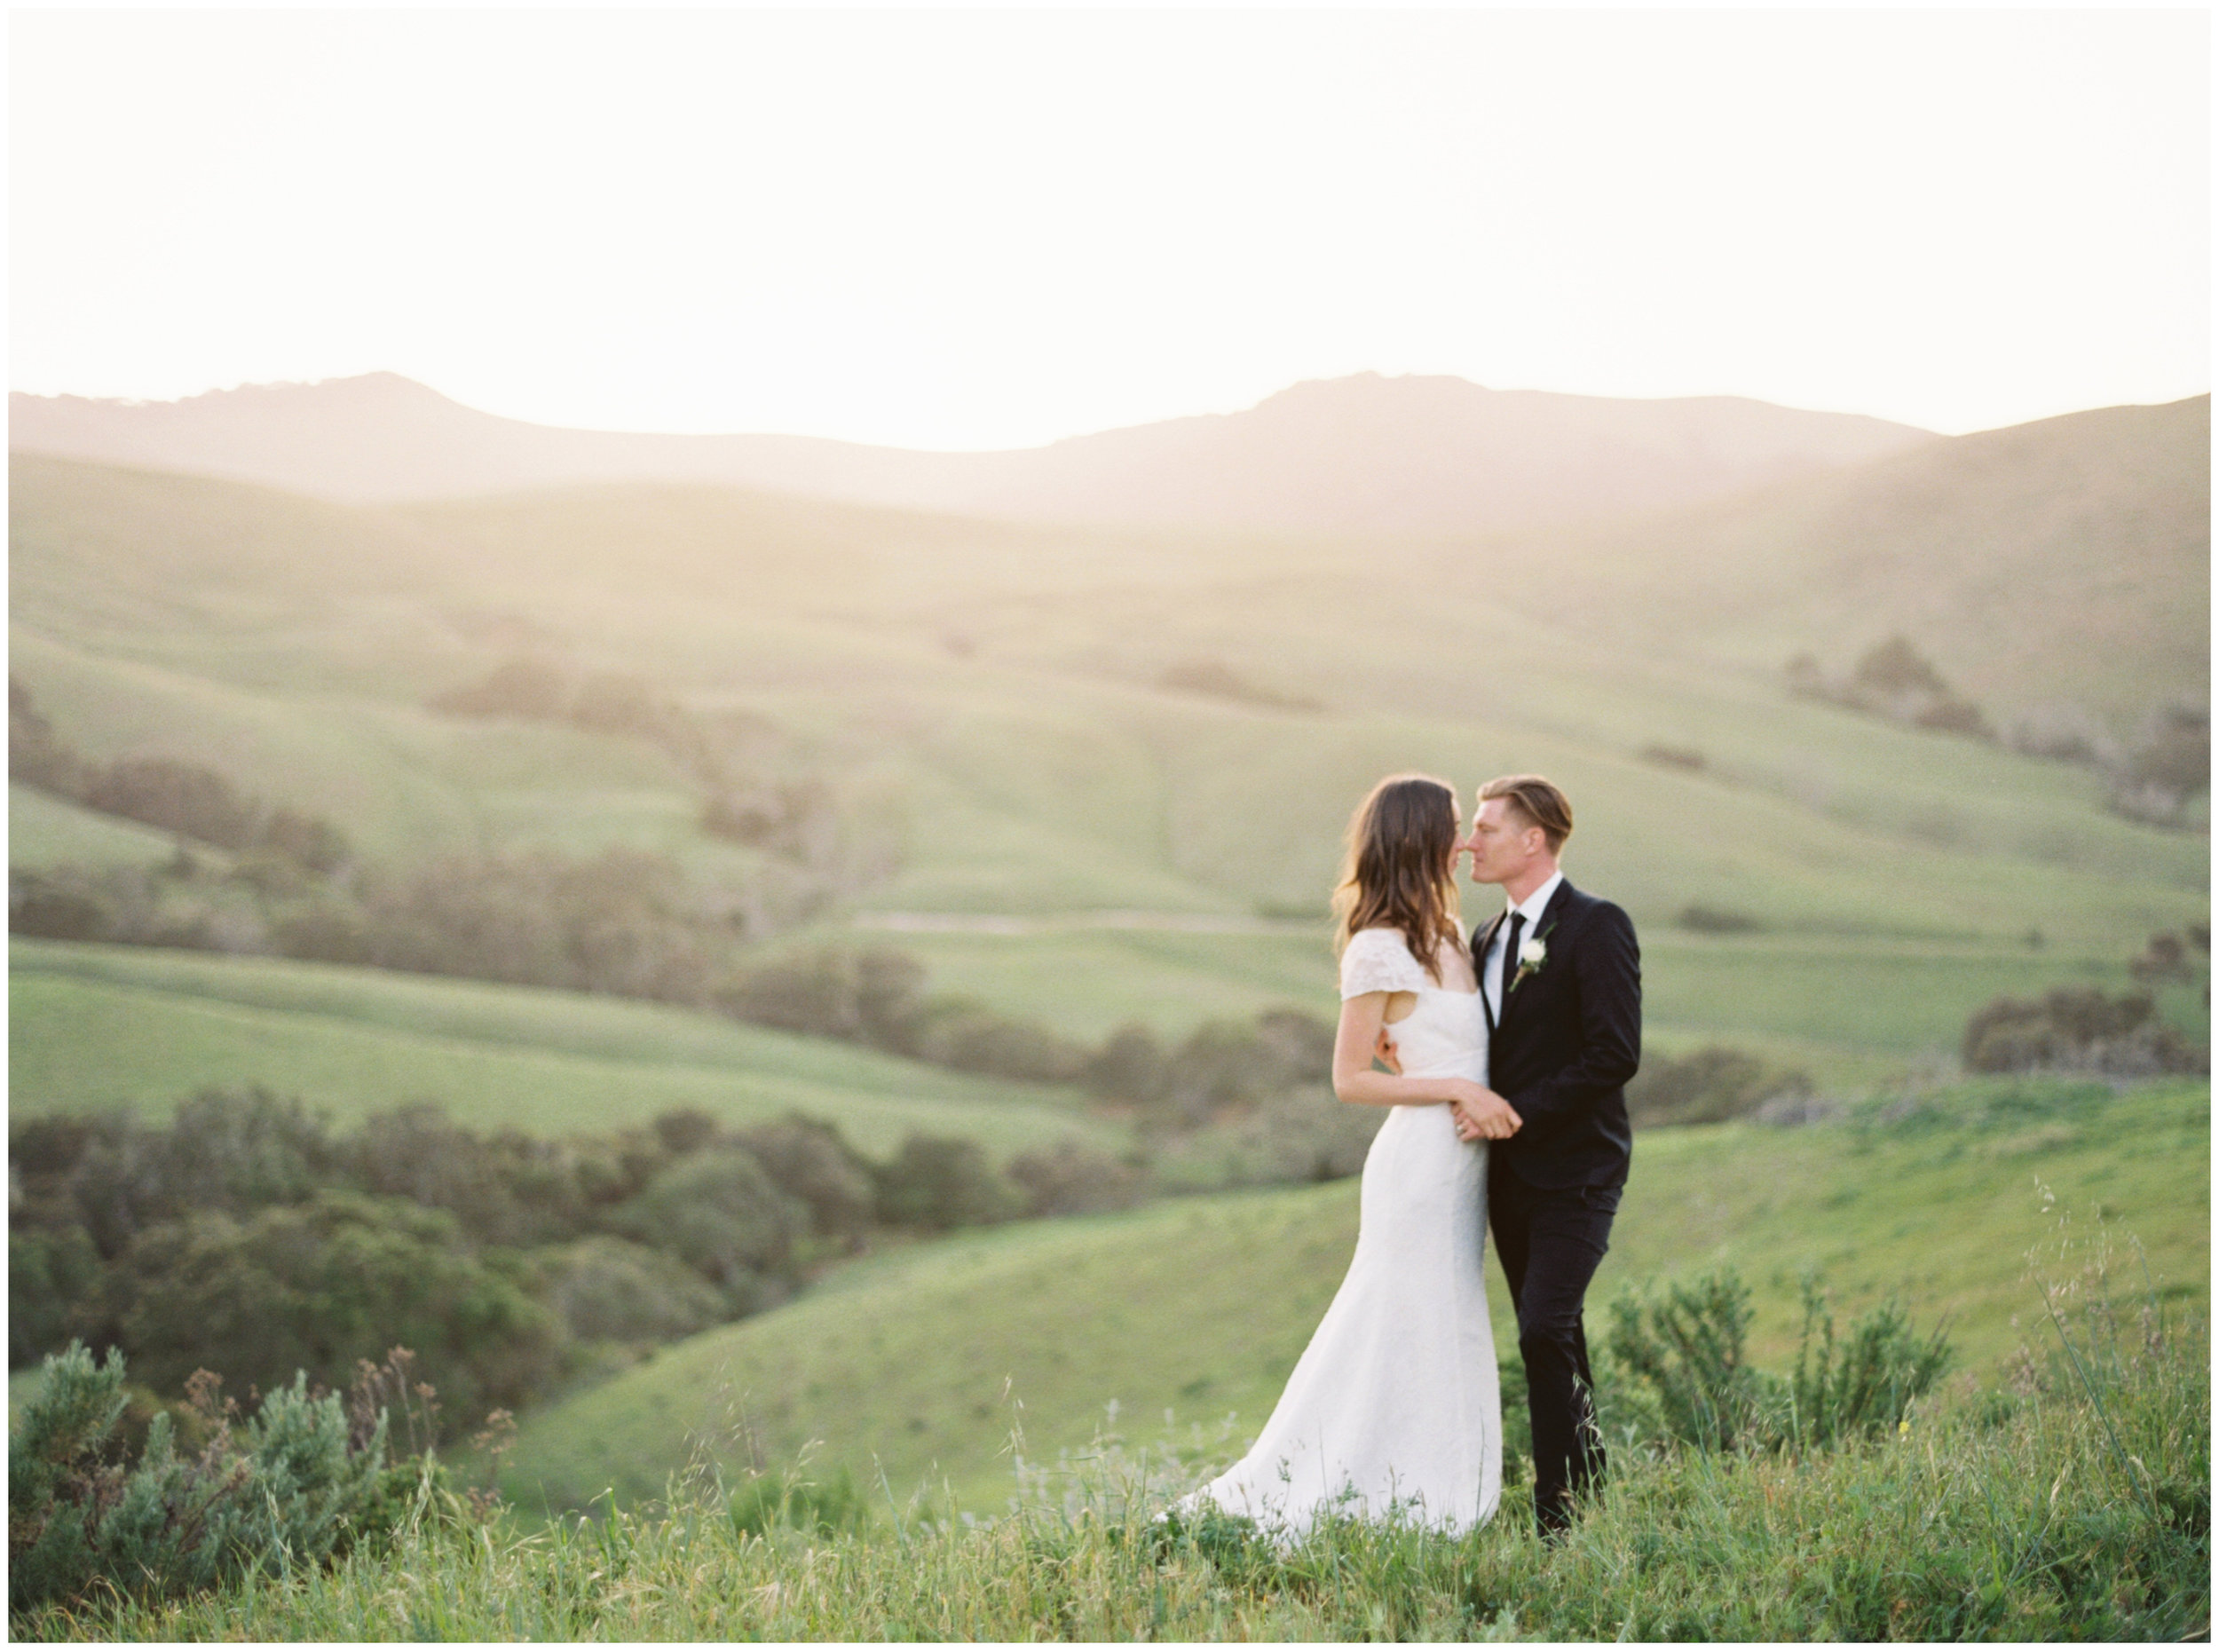 Los_Angeles_Wedding_Photographer_Pinnel_Photography_La_Purisima-3.jpg